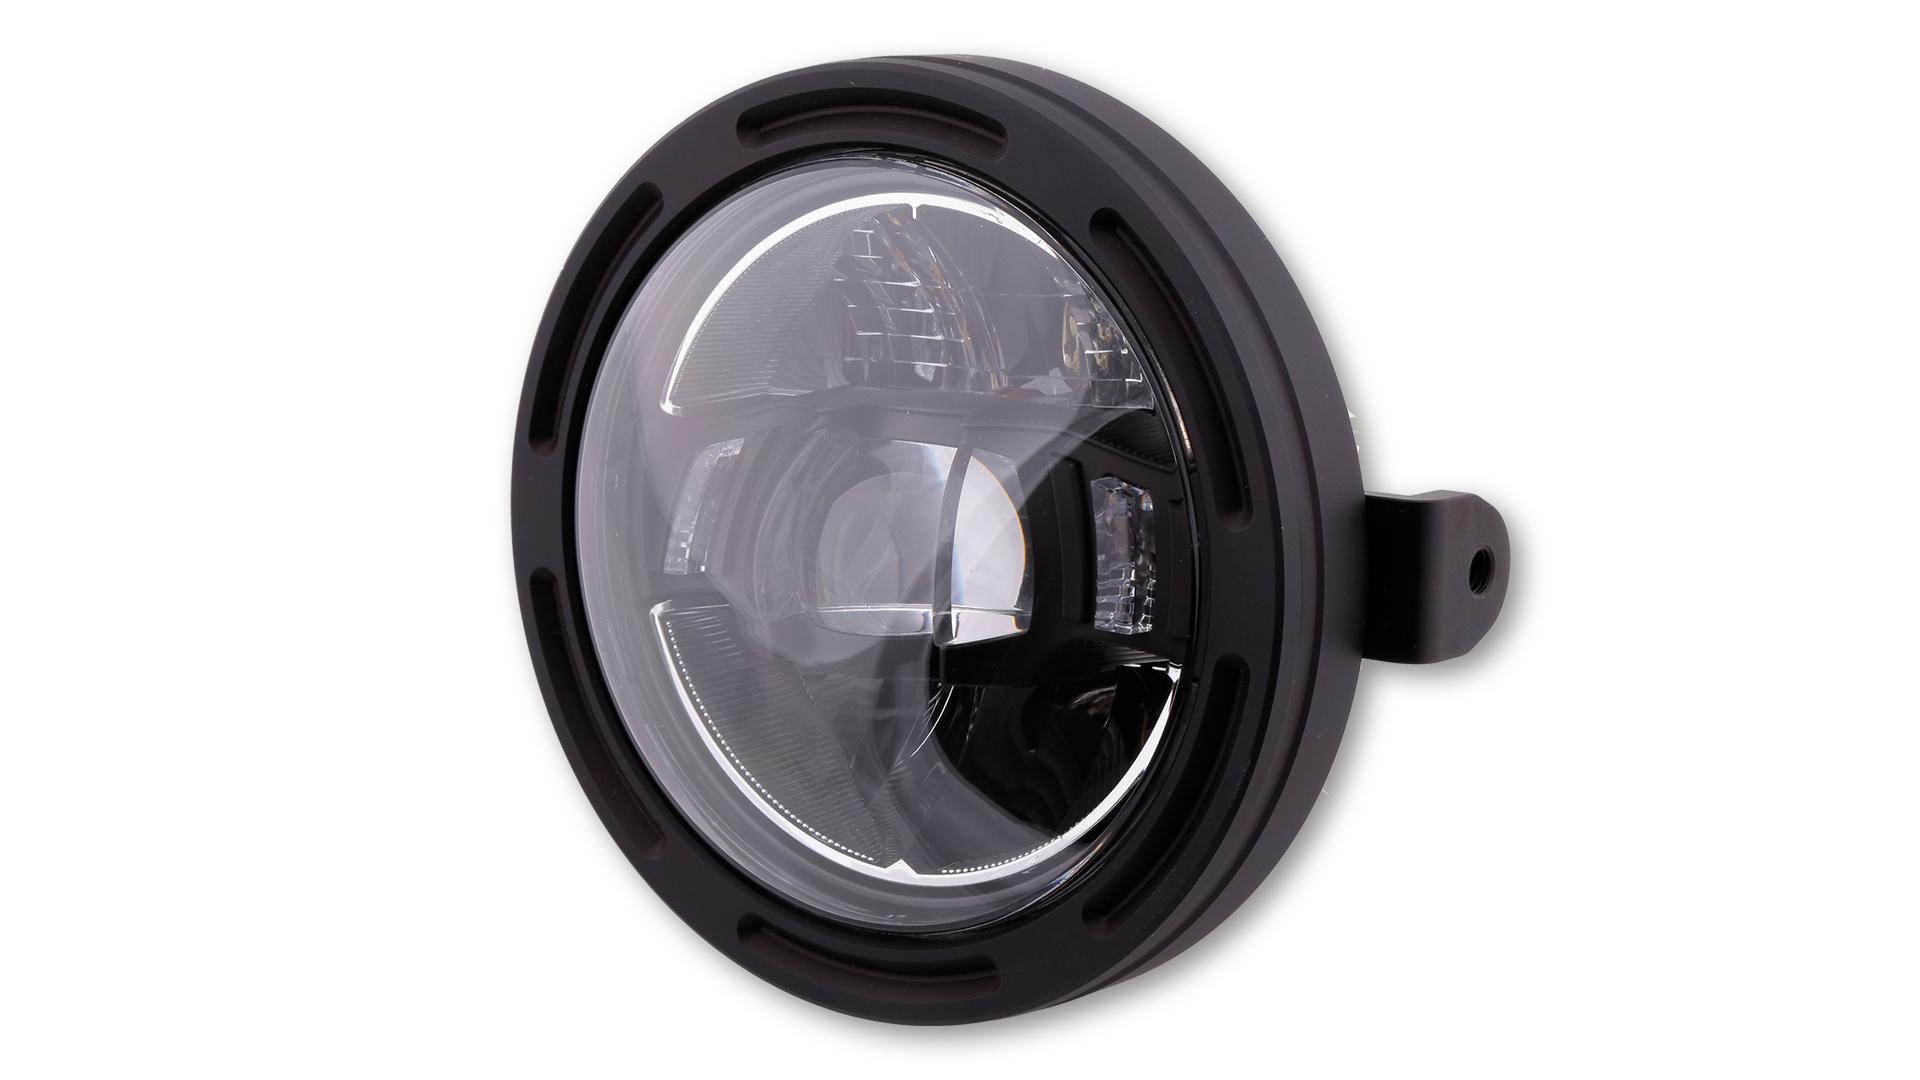 highsider 5 Reflektory LED 3/4 cala FRAME-R2 typ 10